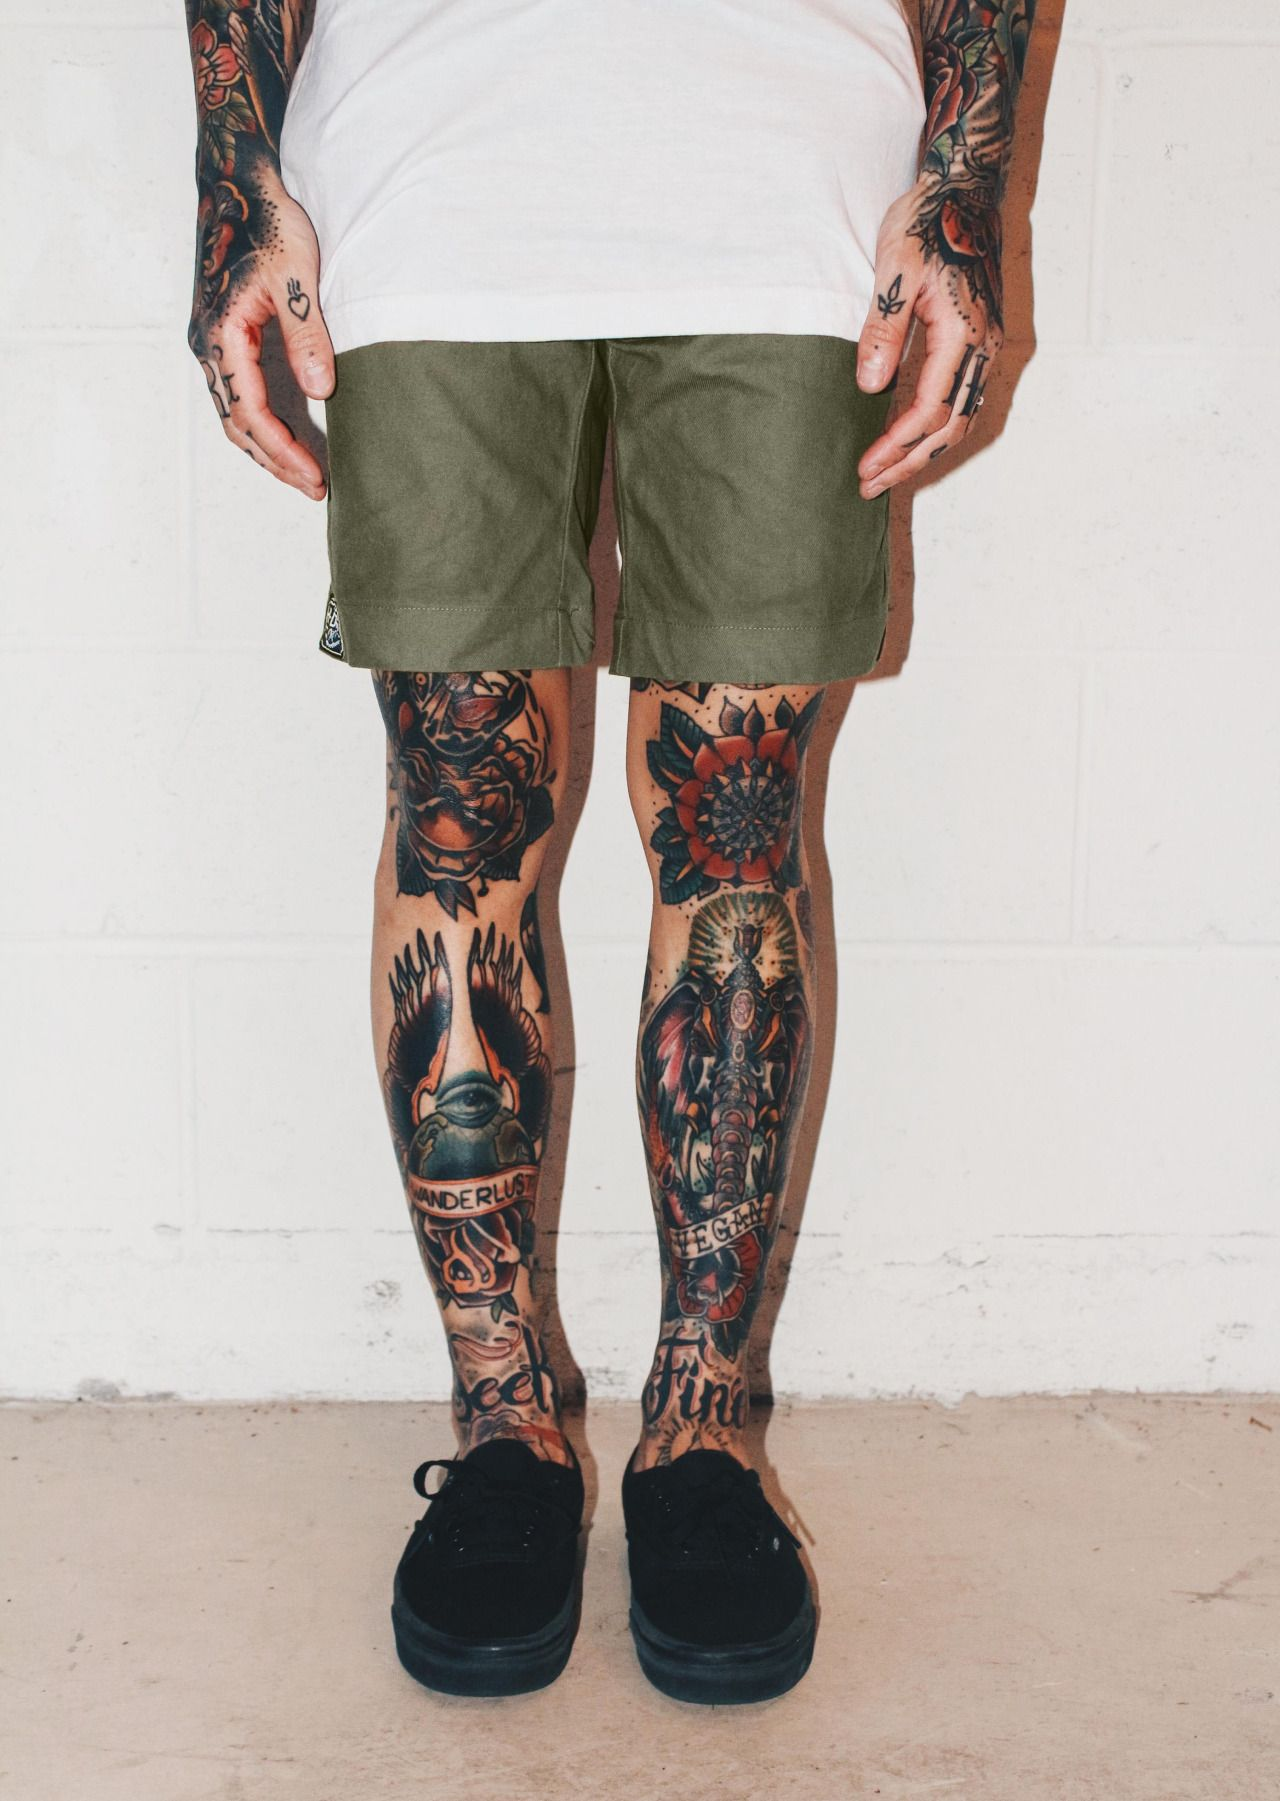 Lower leg guys traditional sleeve tattoos - Olive Signature Shorts Created To Fit To Perfection Www Hrdrvs Com Tattoo Legsleg Tattoosleg Sleeve Tattooankle